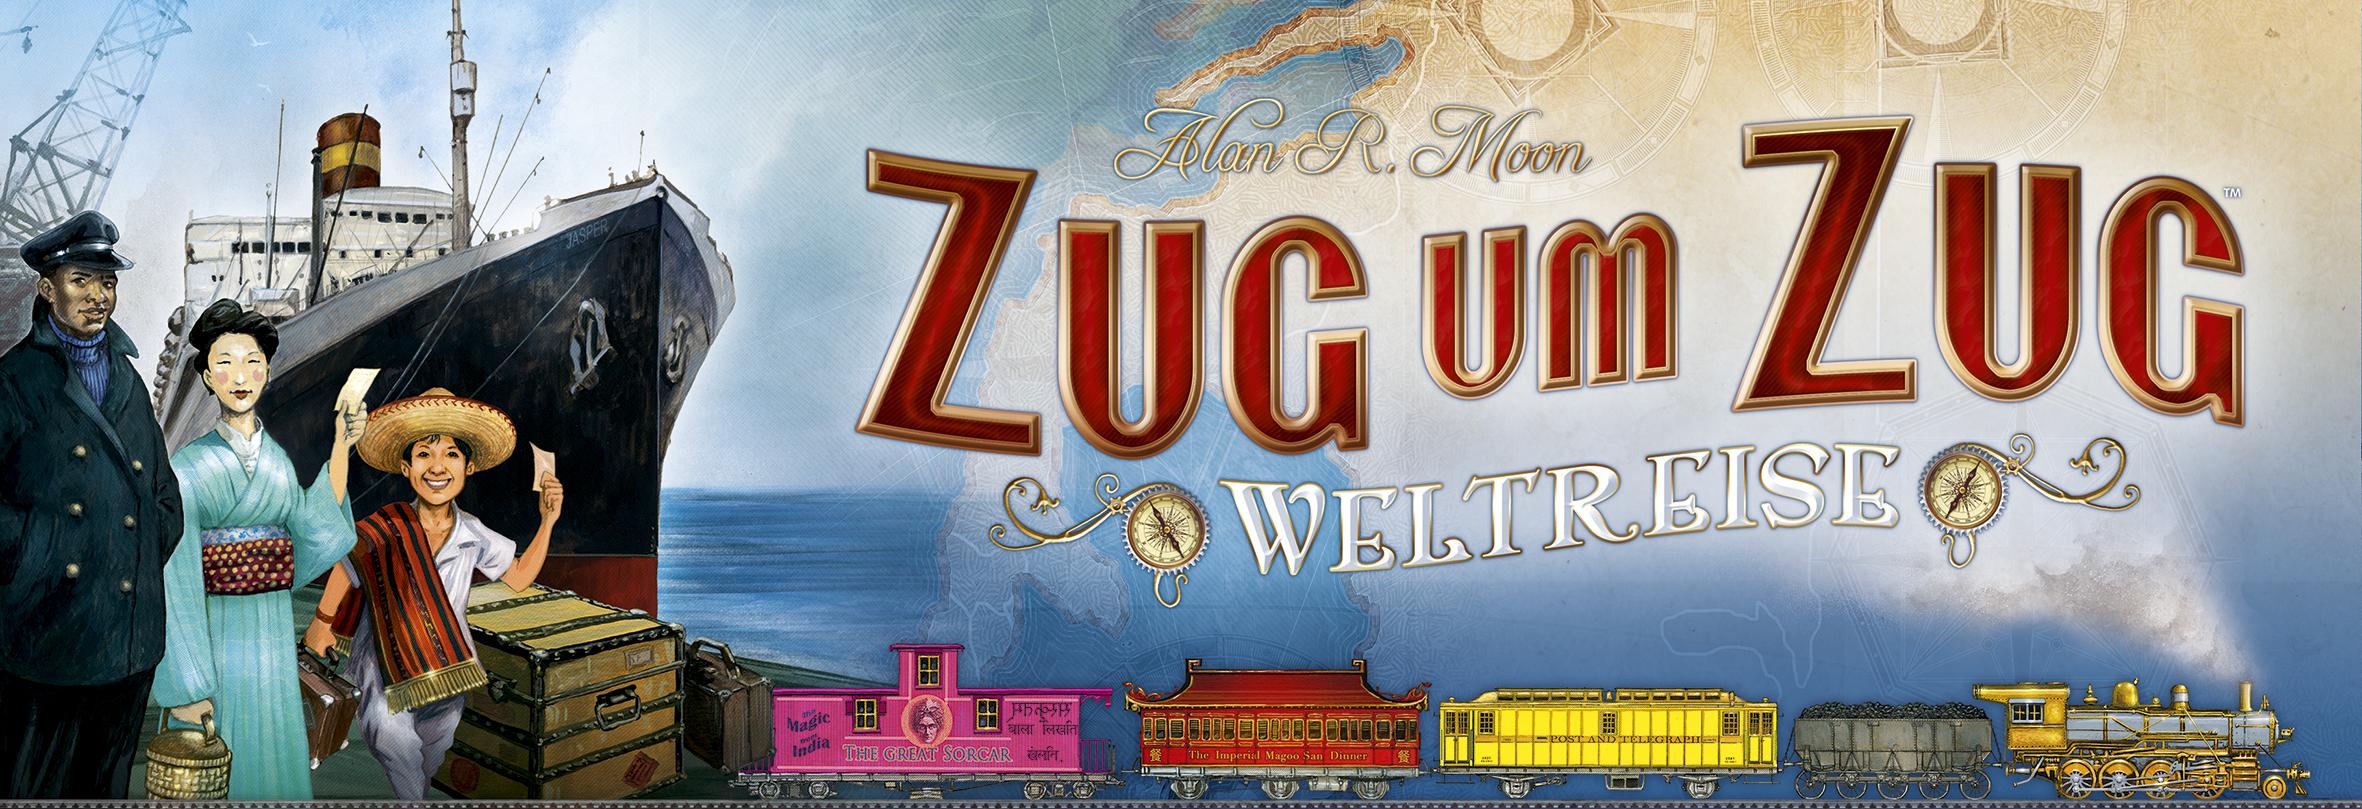 "Days of Wonder kündigt ""Zug um Zug: Weltreise"" an"